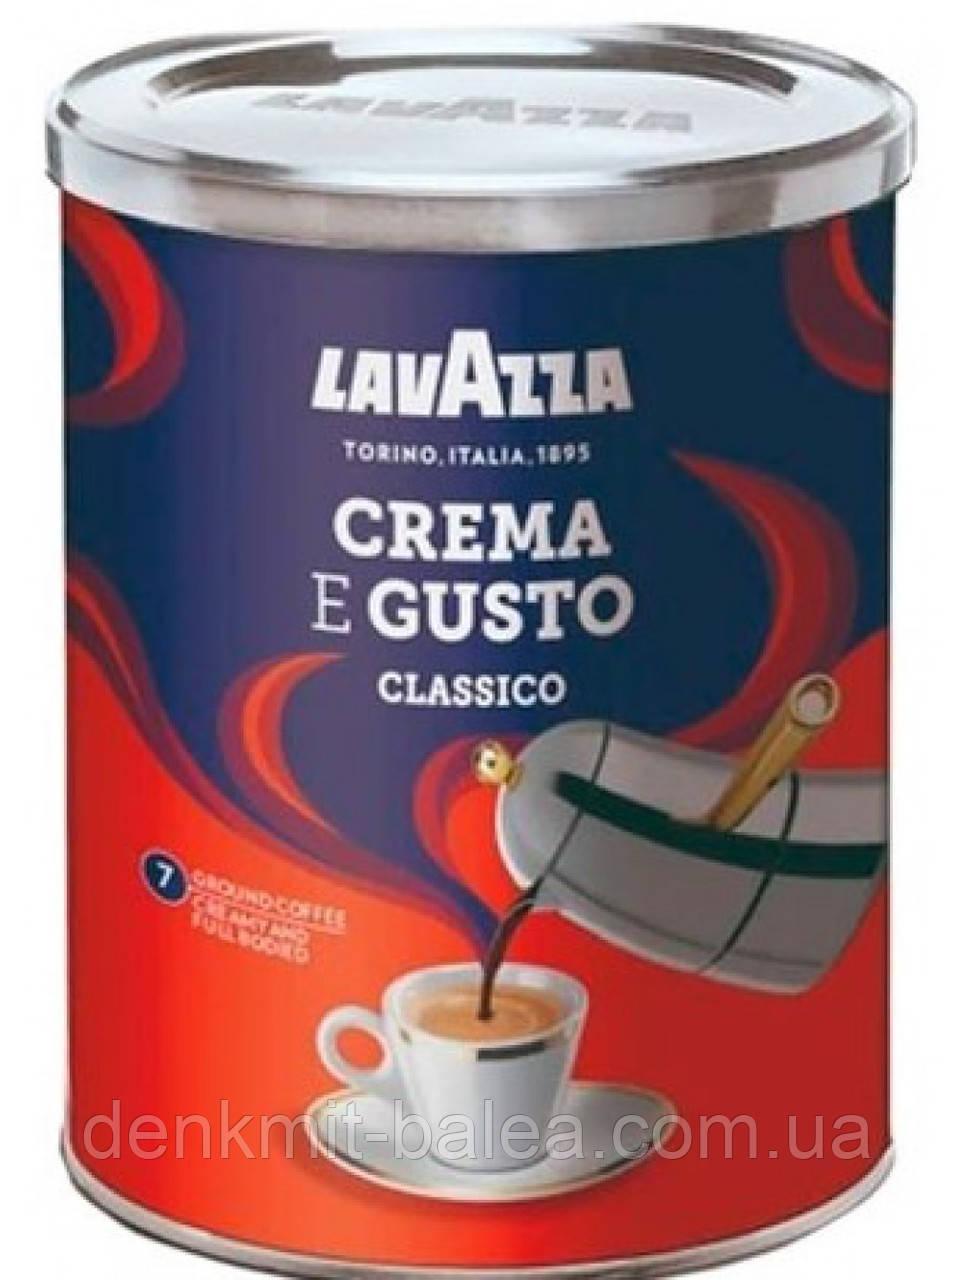 Мелена кава Крему Густо в Металевій банці Lavazza Crema E Gusto 250 гр